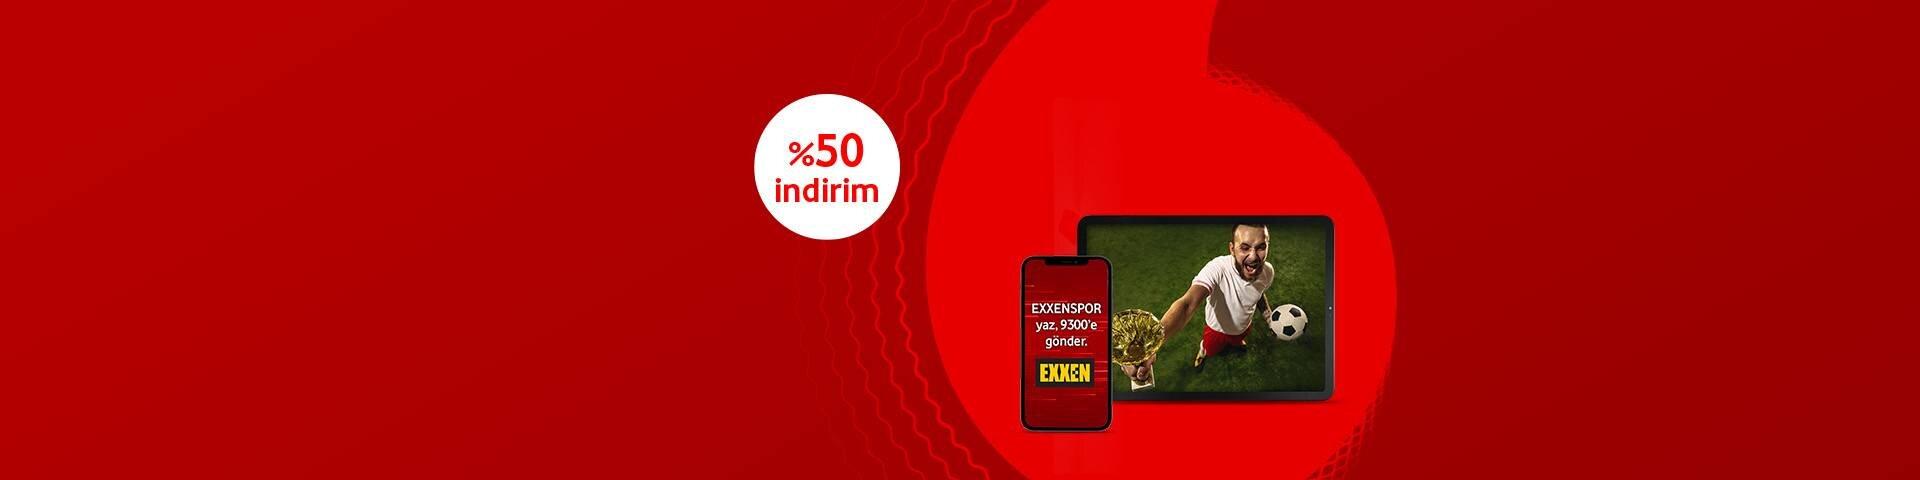 Vodafone Mobil Ödeme ile Exxen Spor